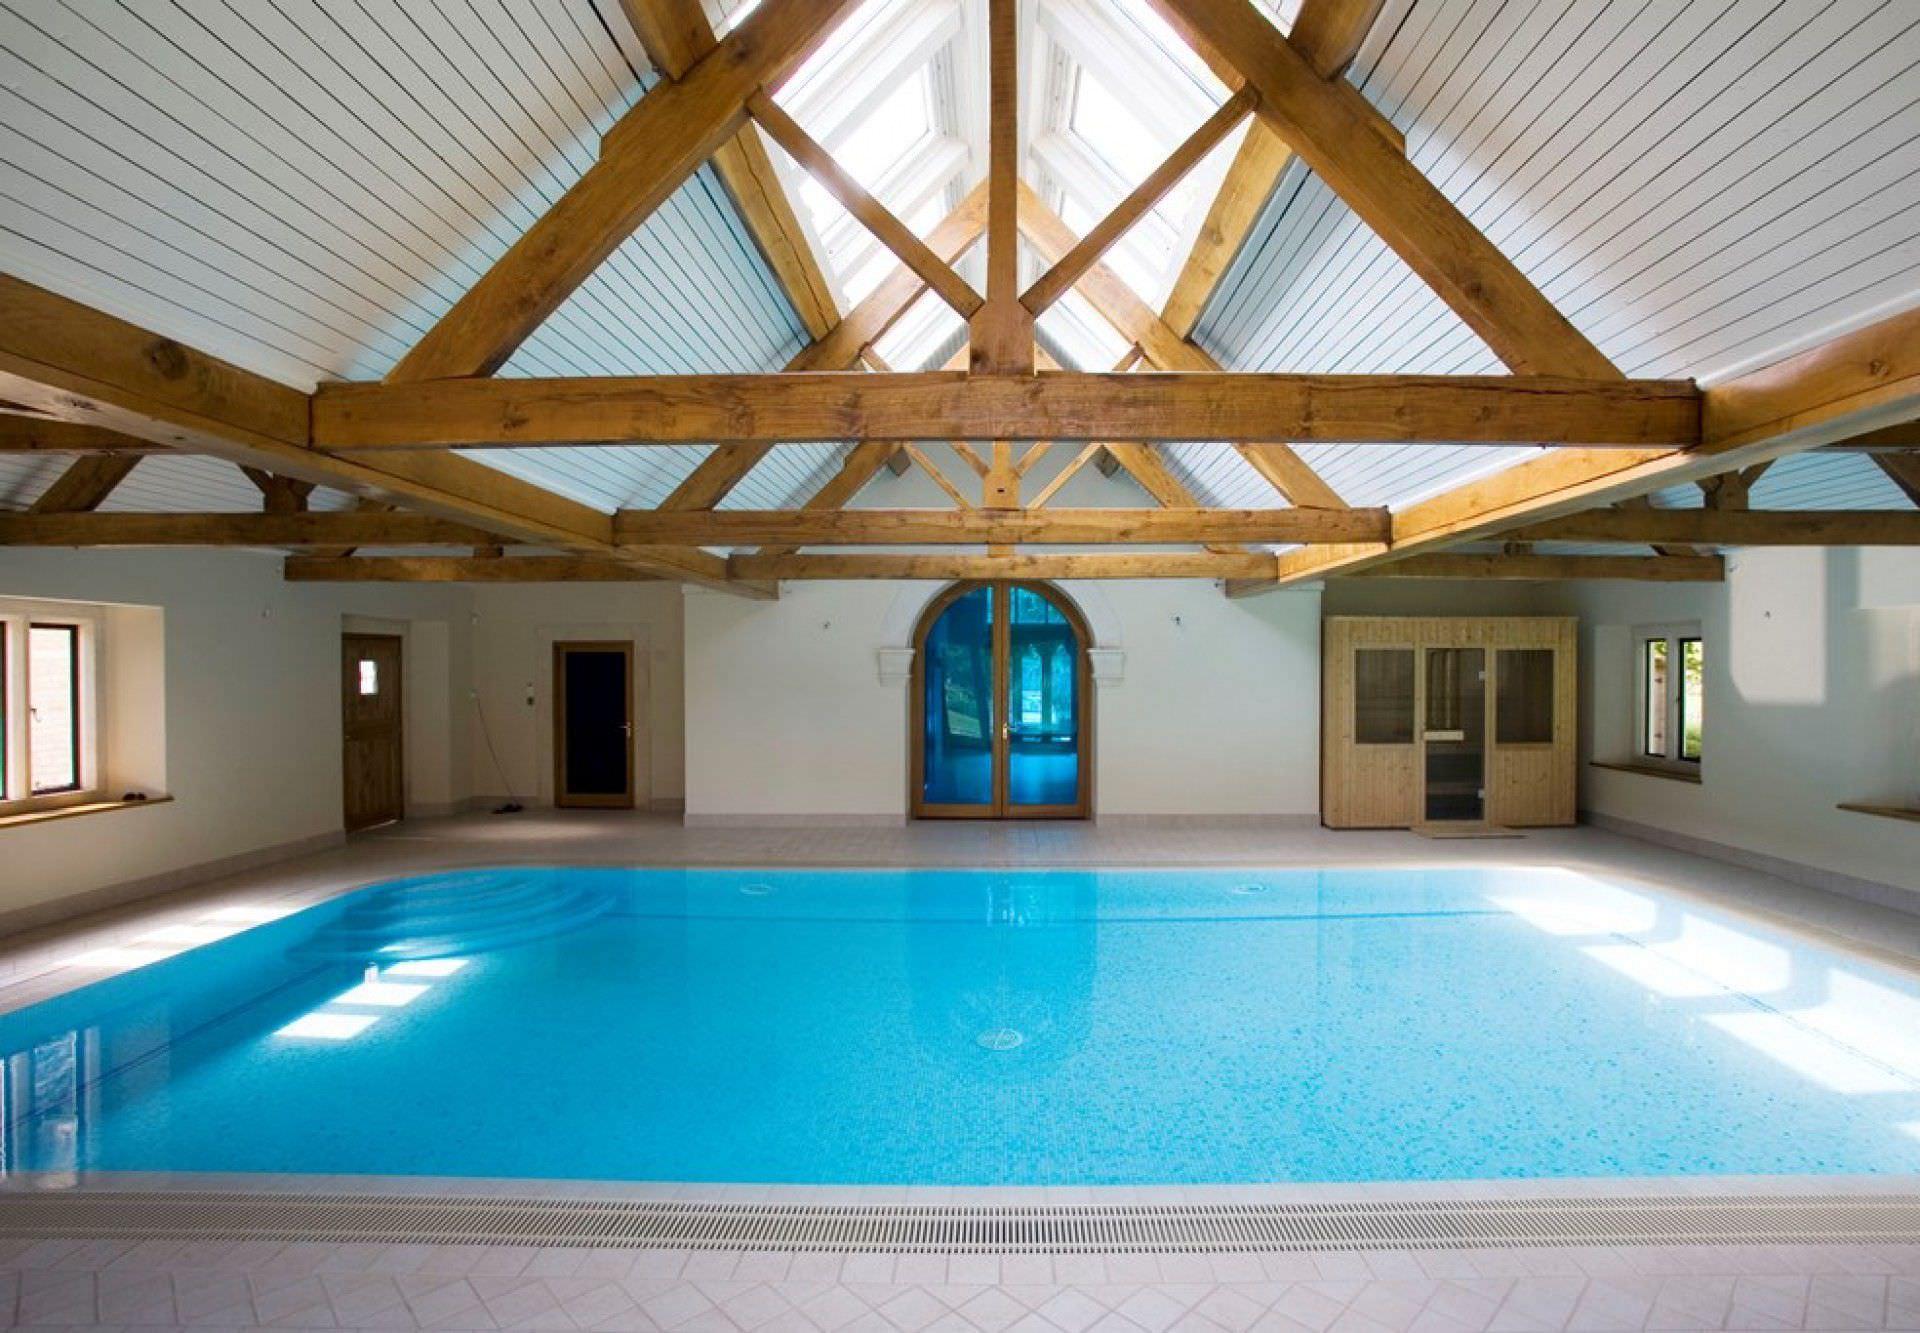 Public Swimming Pool Design In Ground Swimming Pool Stone Mosaic Indoor Hampshire